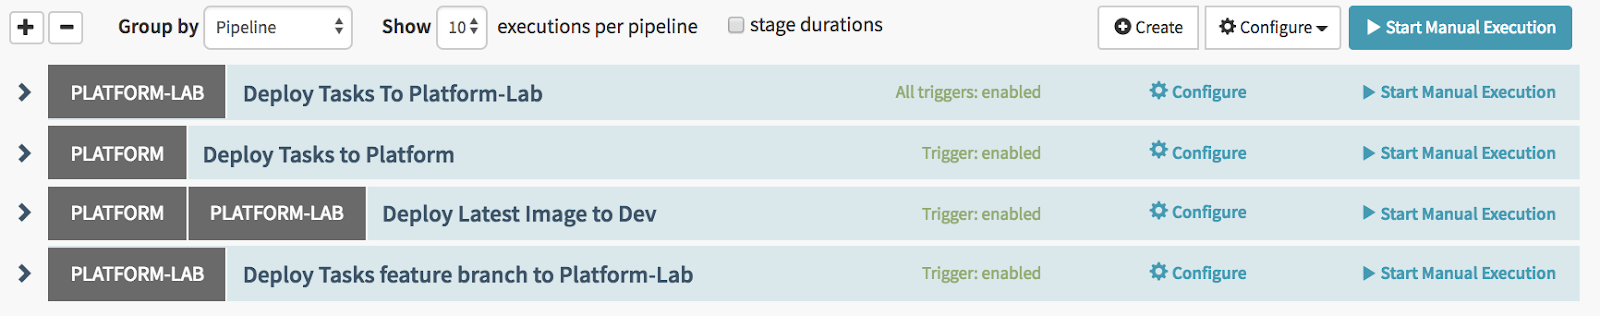 Deployment Pipelines for a Descartes Labs Service